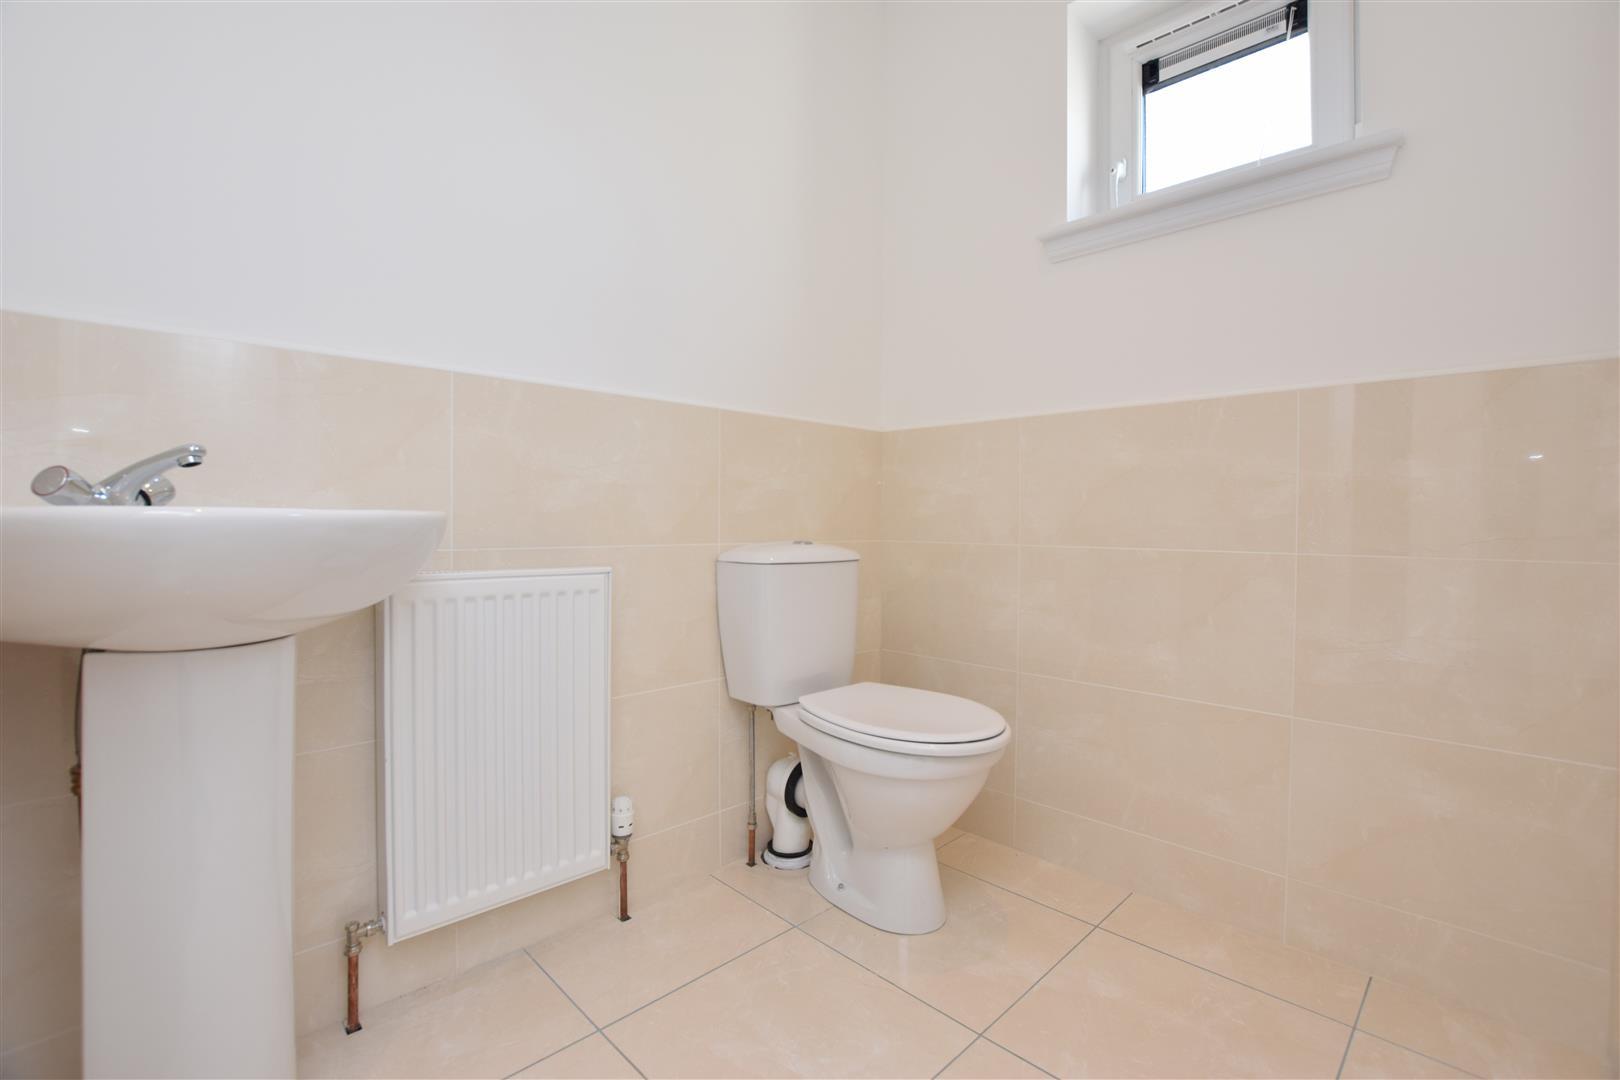 3, Leadmill Lane, Auchterarder, Perthshire, PH3 1RY, UK